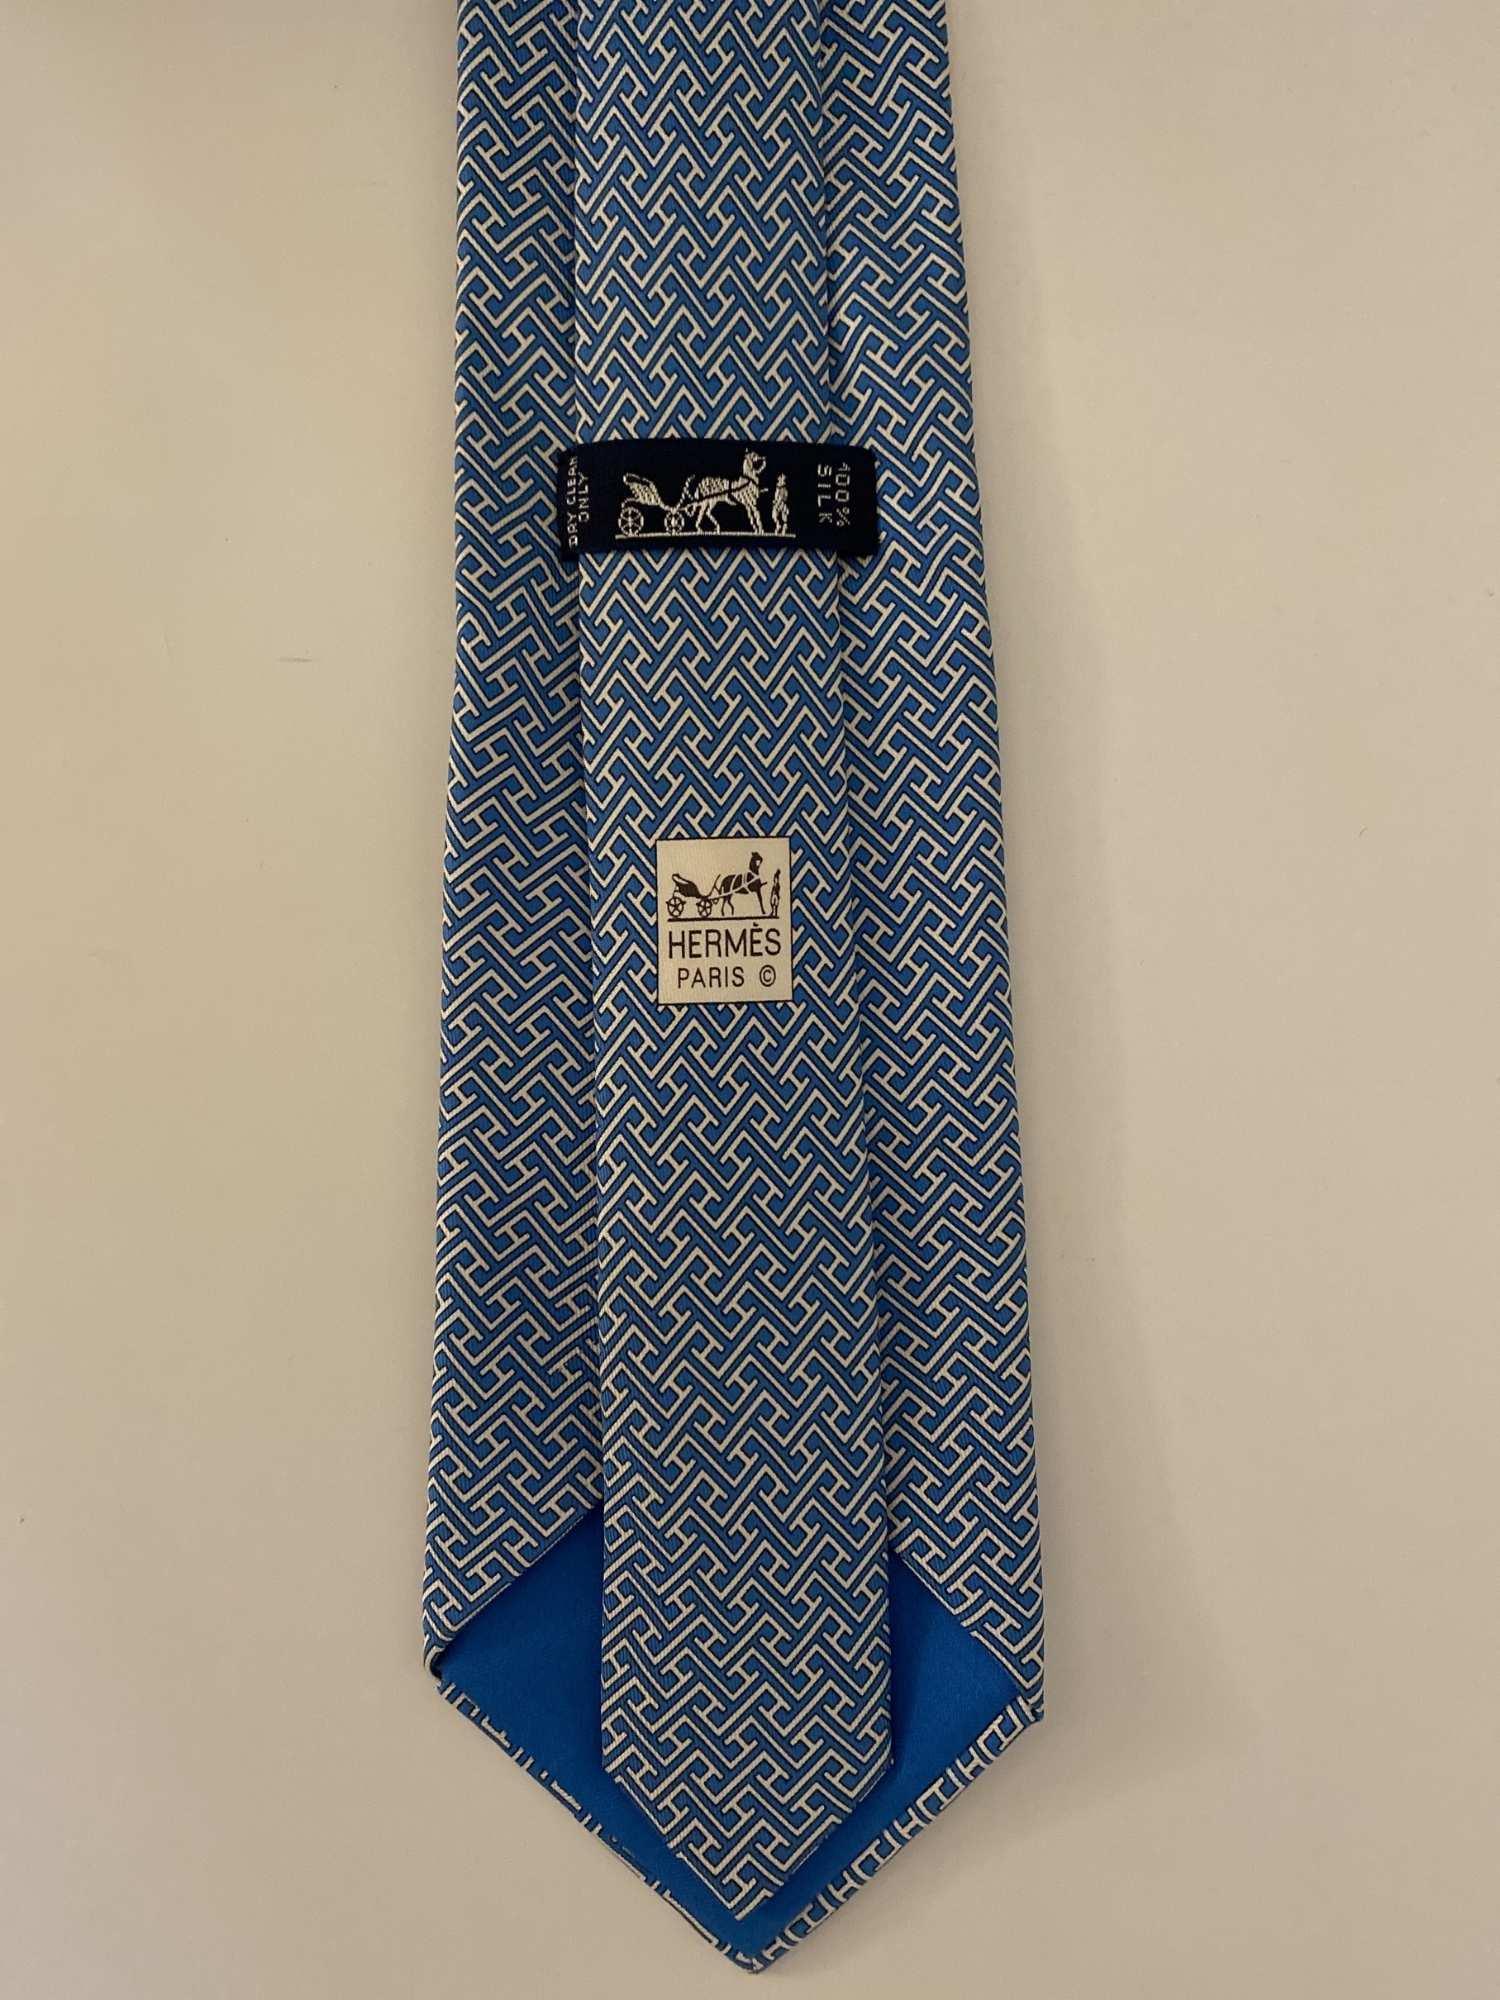 Gravata Hermès Azul e Branca